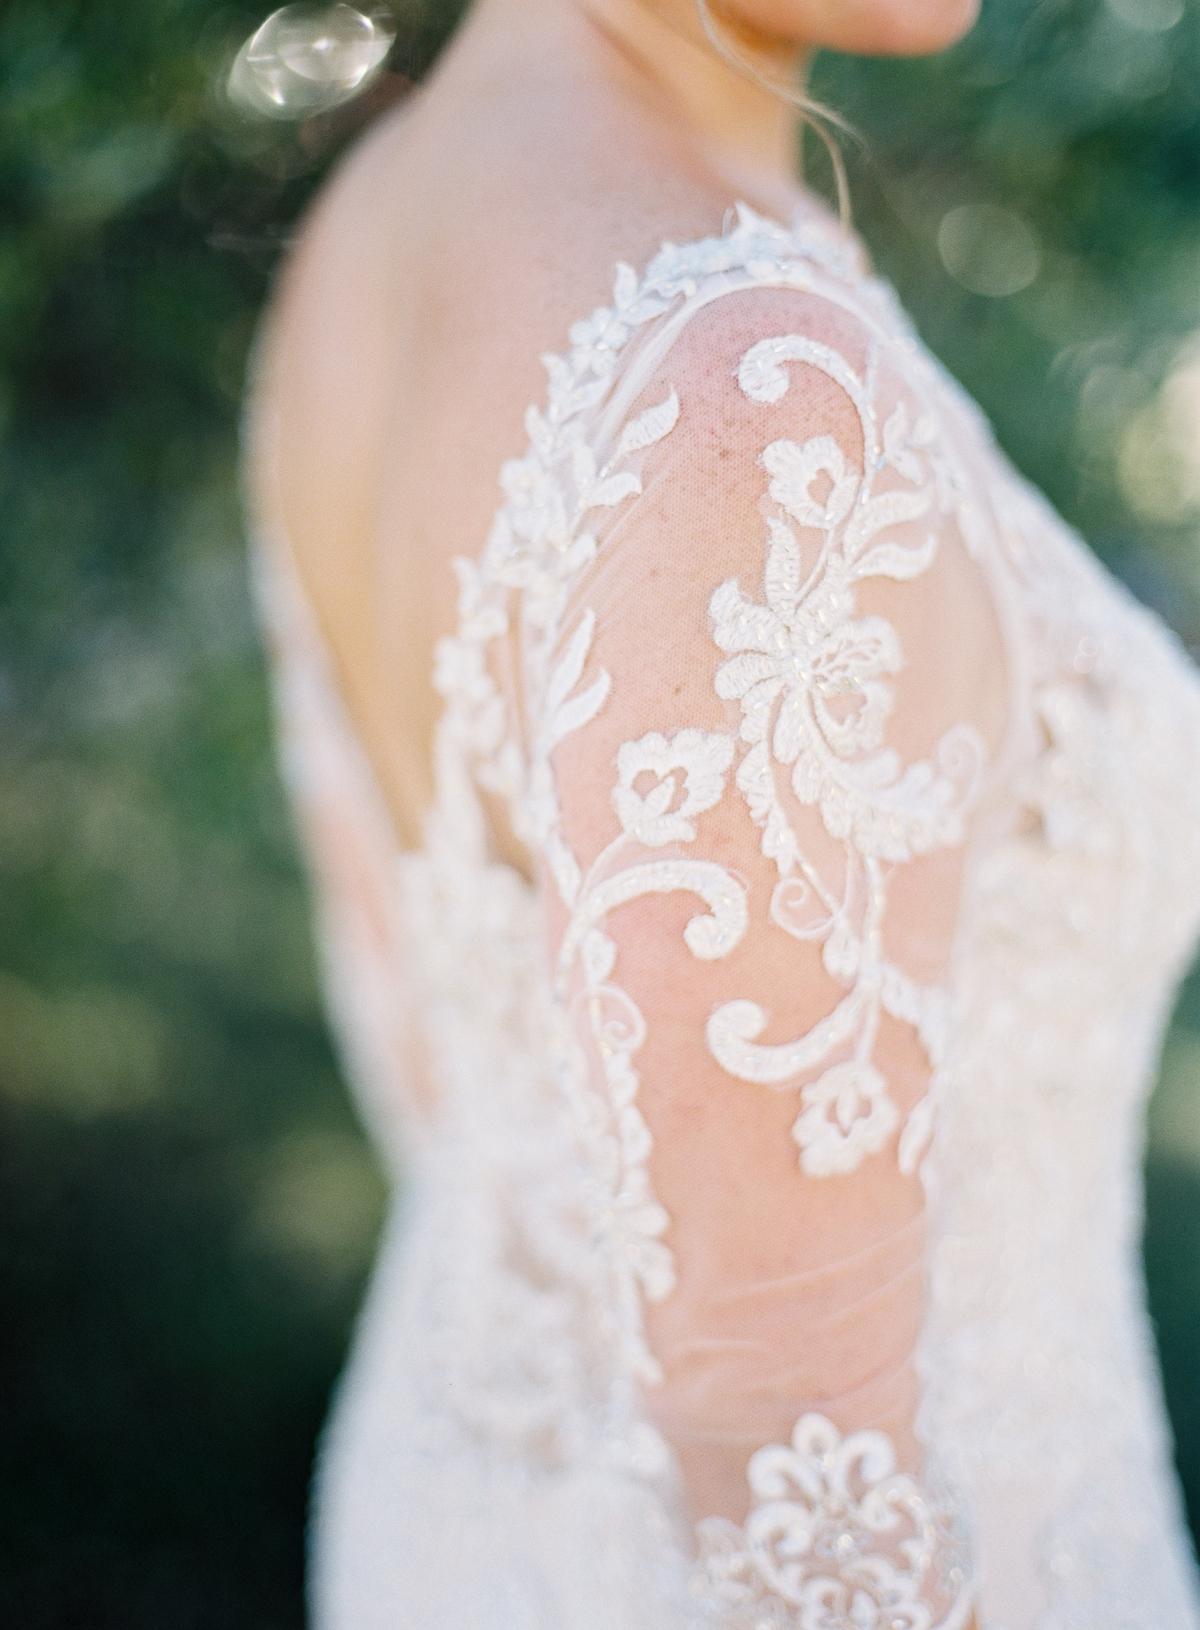 The Vine Grove Mudgee Wedding, Photography by Mr Edwards_1802.jpg